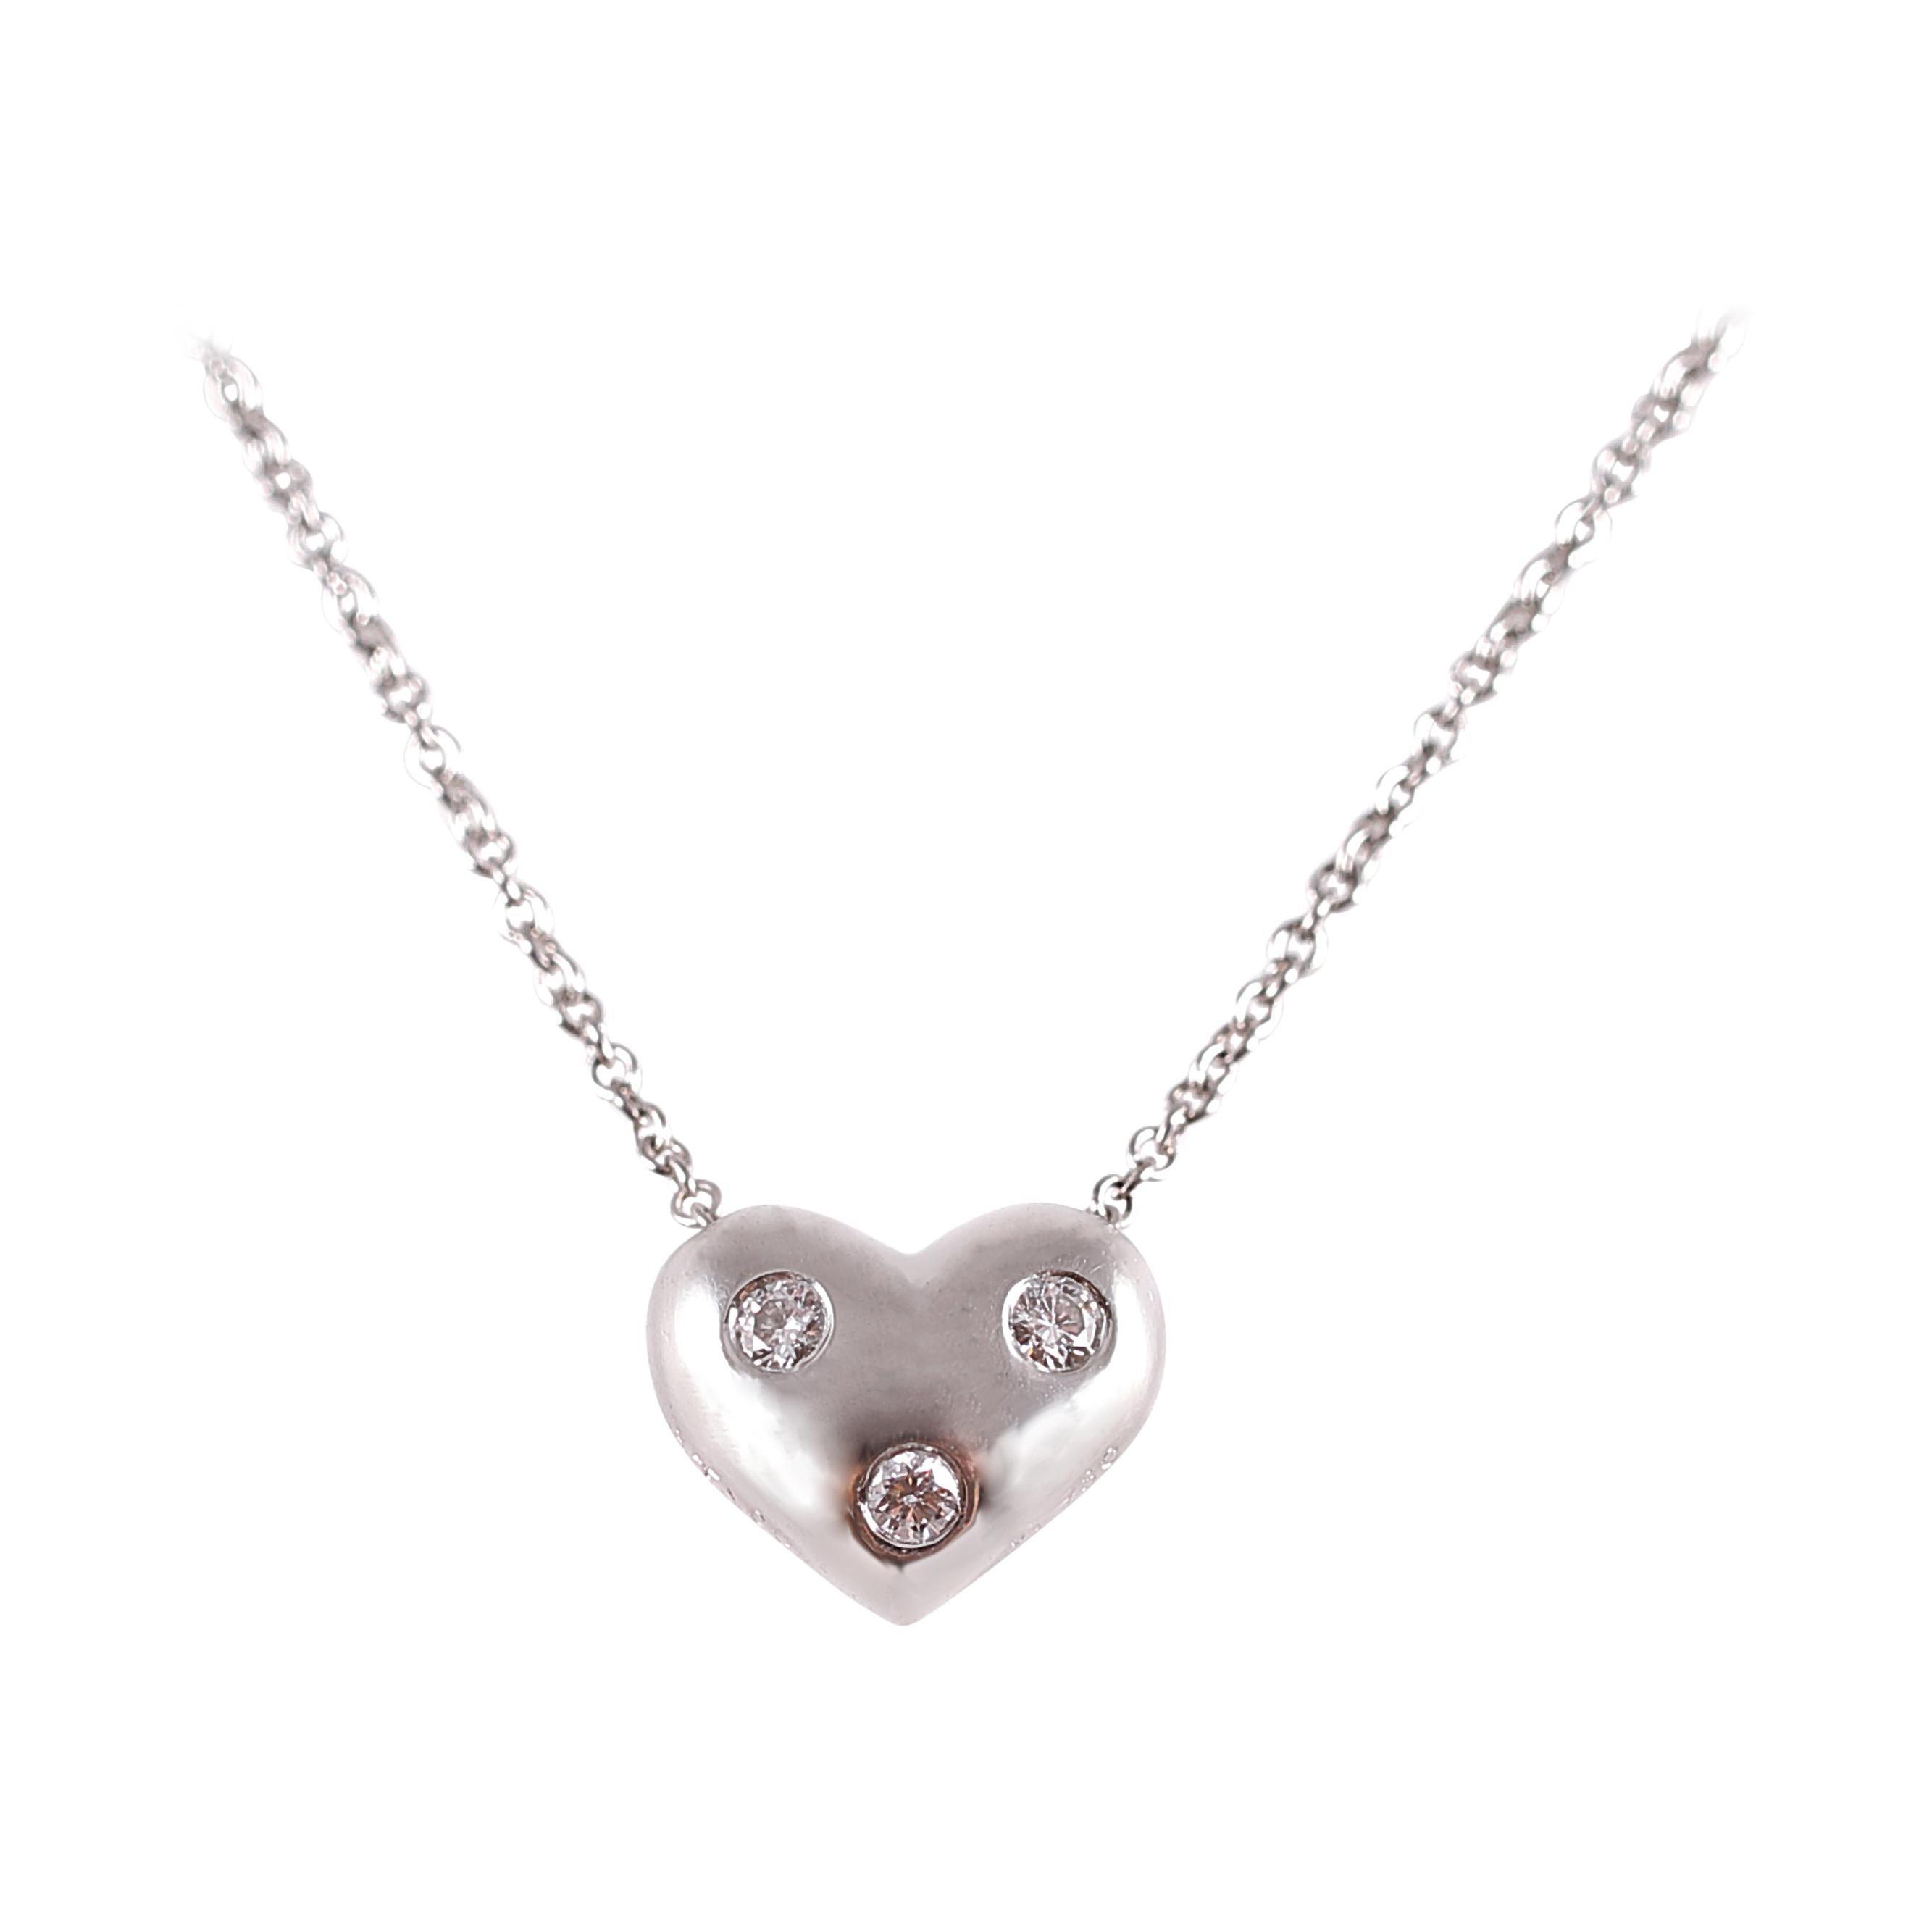 Tiffany & Co. Diamond Heart Necklace in Platinum